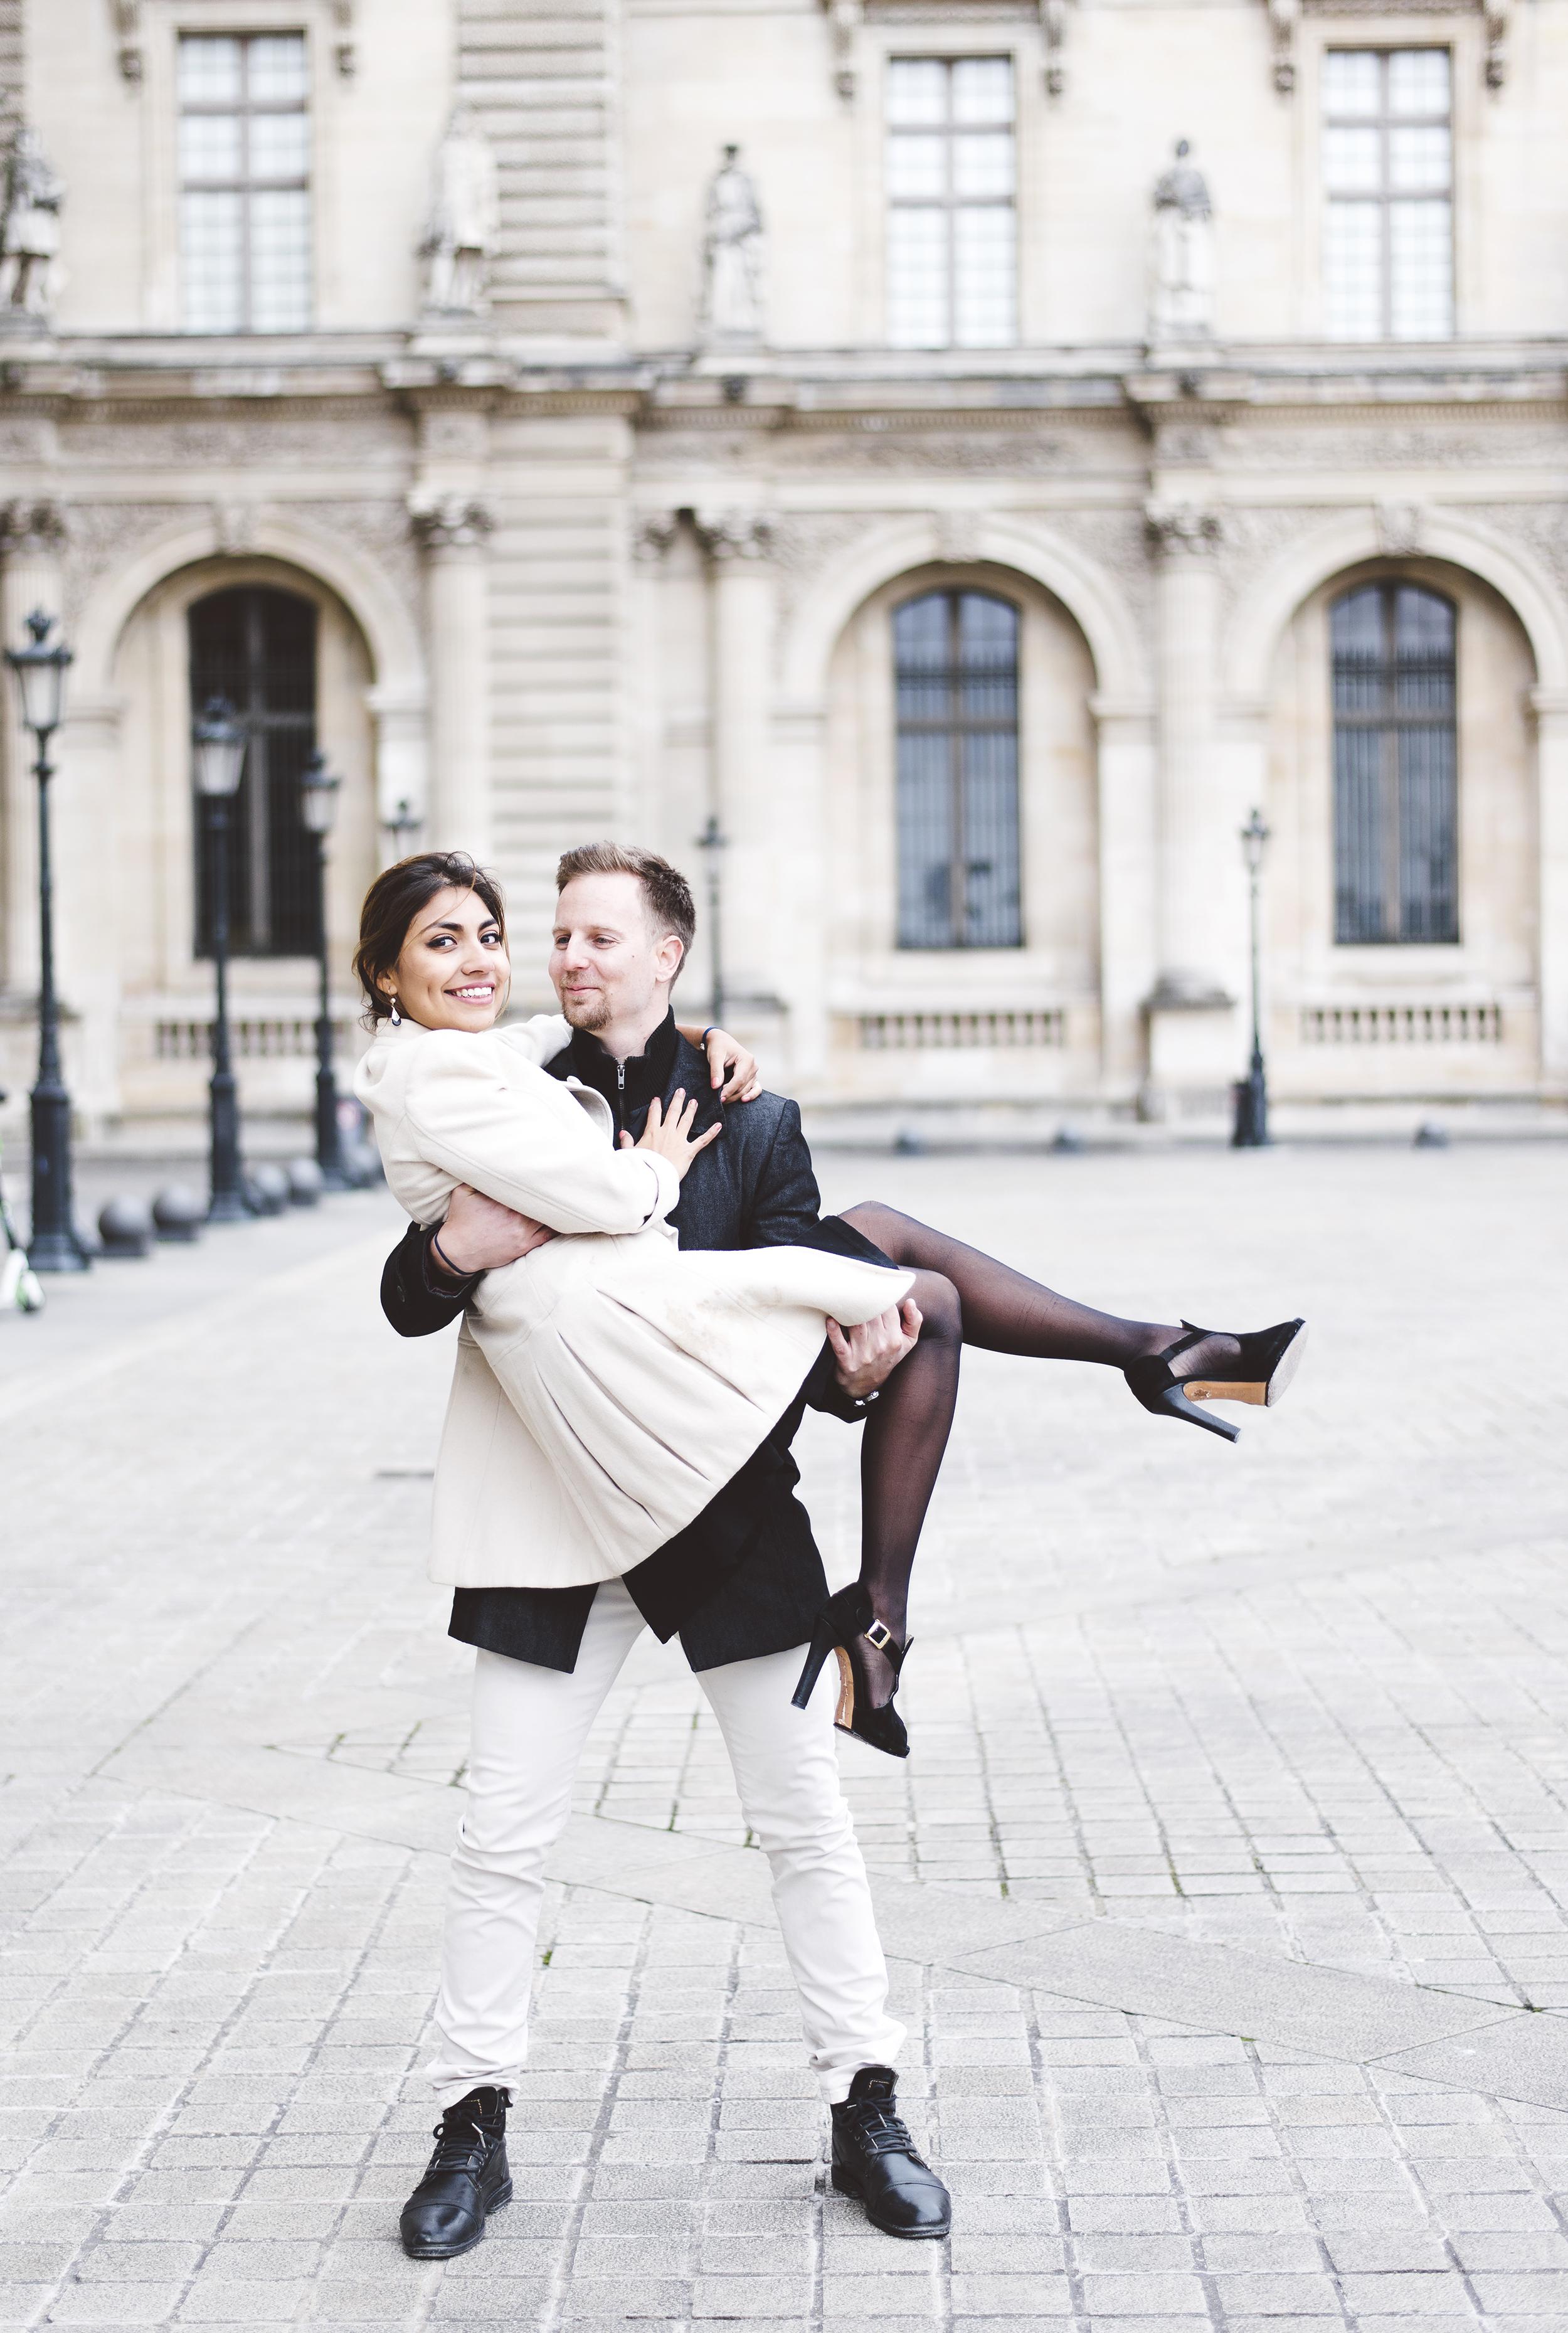 Couple-photoshoot-Anniversary-Paris-Louvre-Tuileries091.jpg